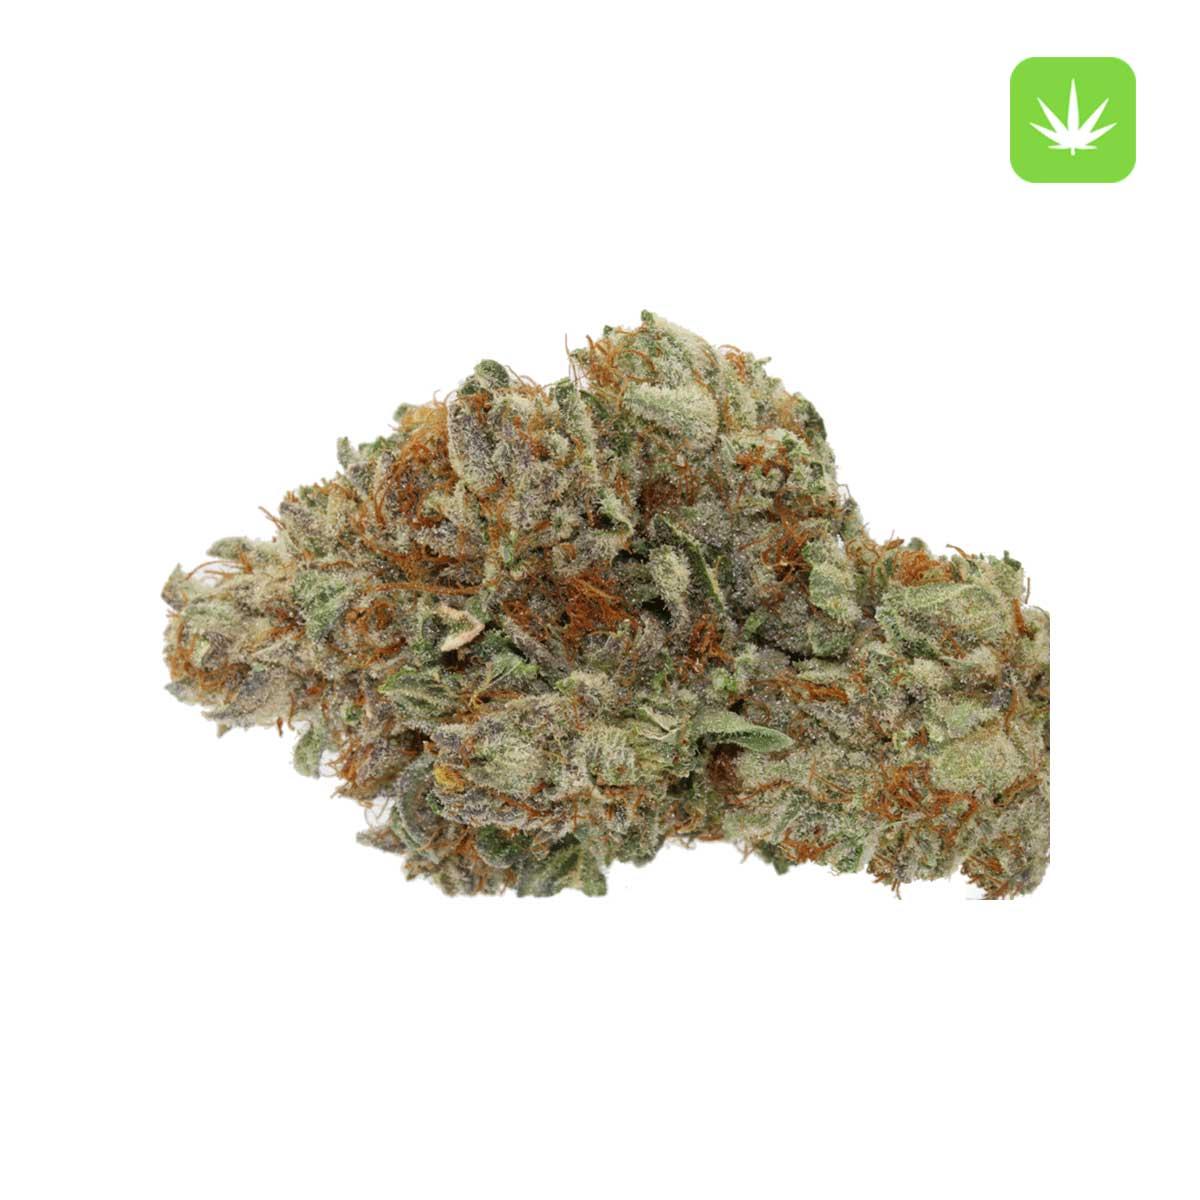 Kosher Kush 2 Cannabis Avenue 600x600 1 1